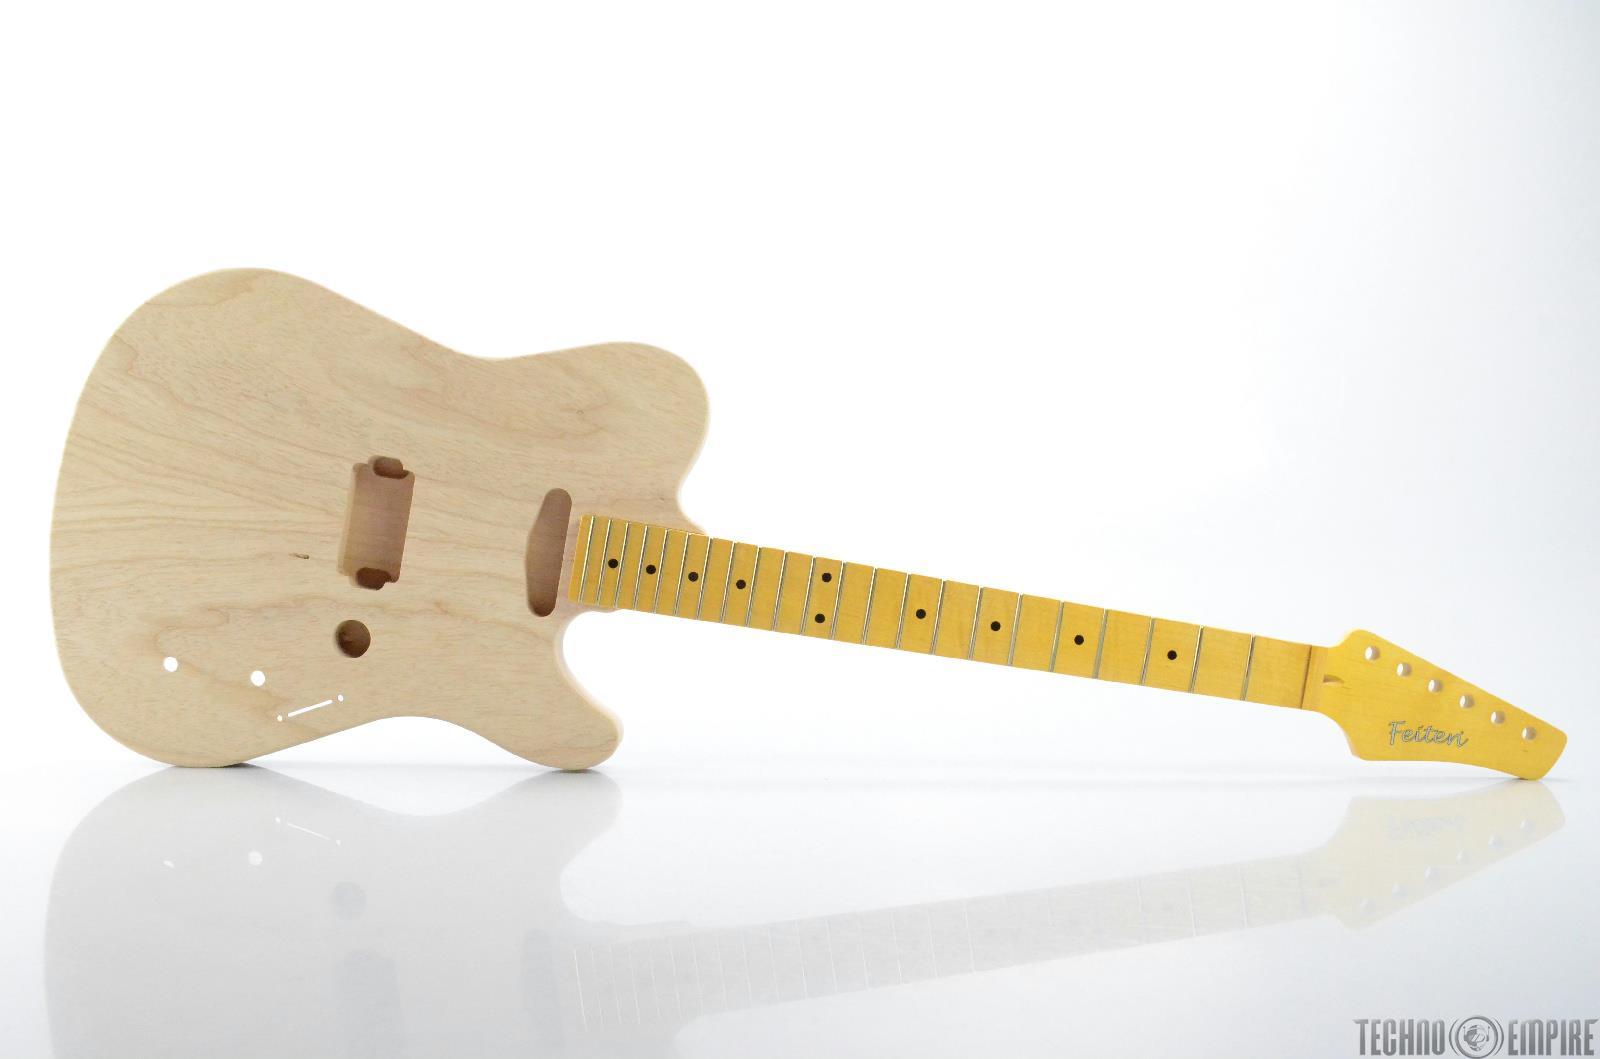 buzz feiten elite pro build your own electric guitar kit 28466 techno empire. Black Bedroom Furniture Sets. Home Design Ideas